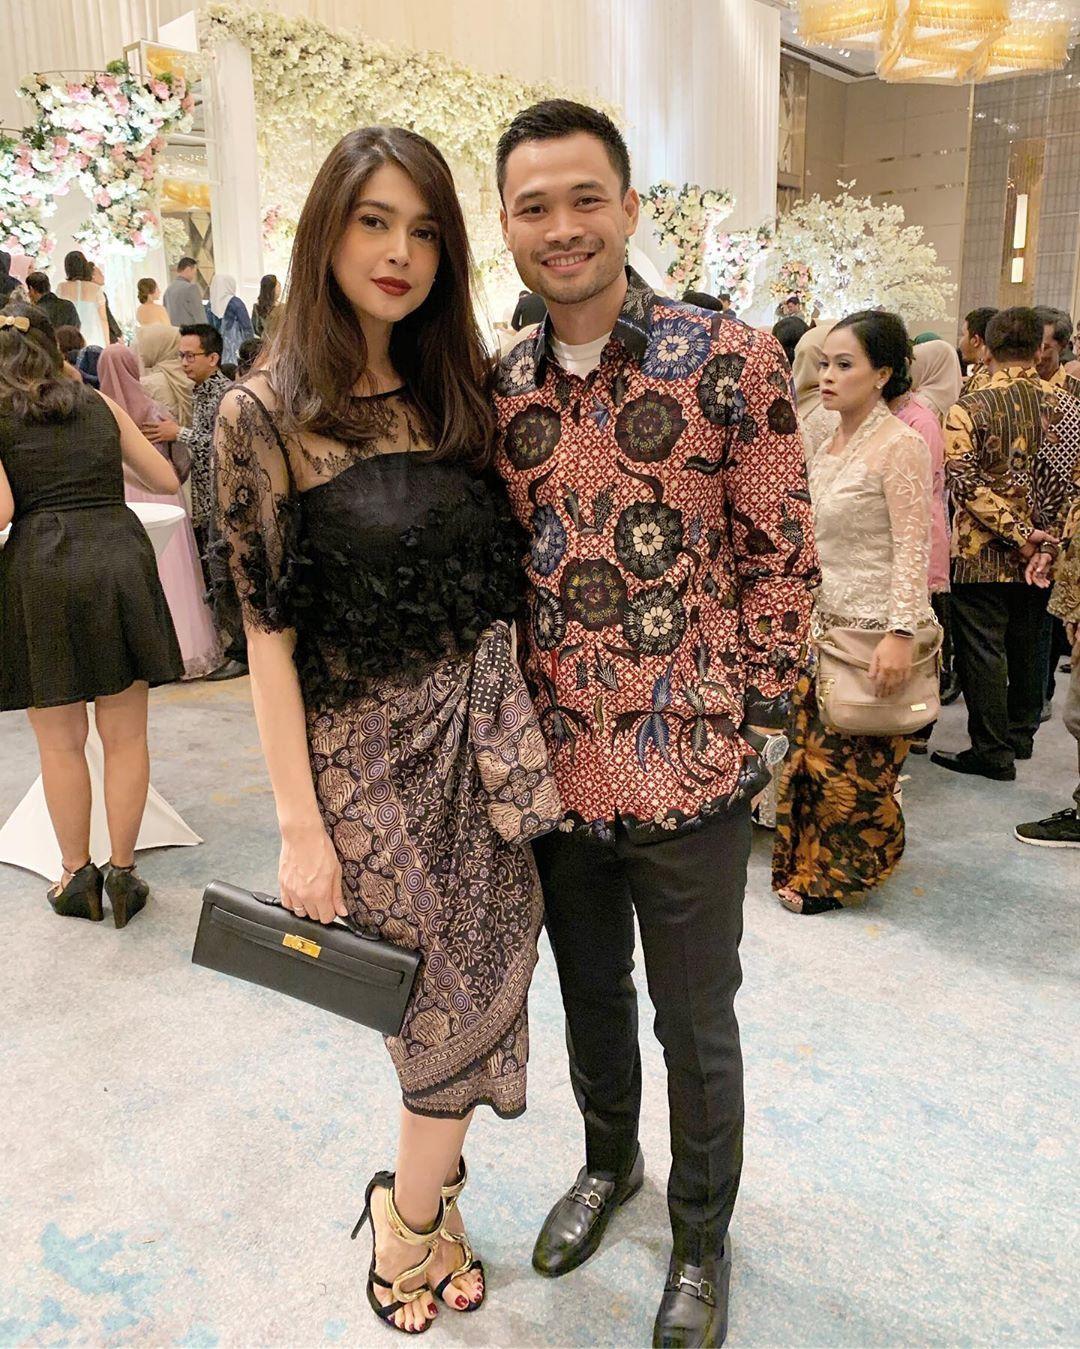 Deretan Seleb di Resepsi Citra Kirana & Rezky Aditya di Jakarta